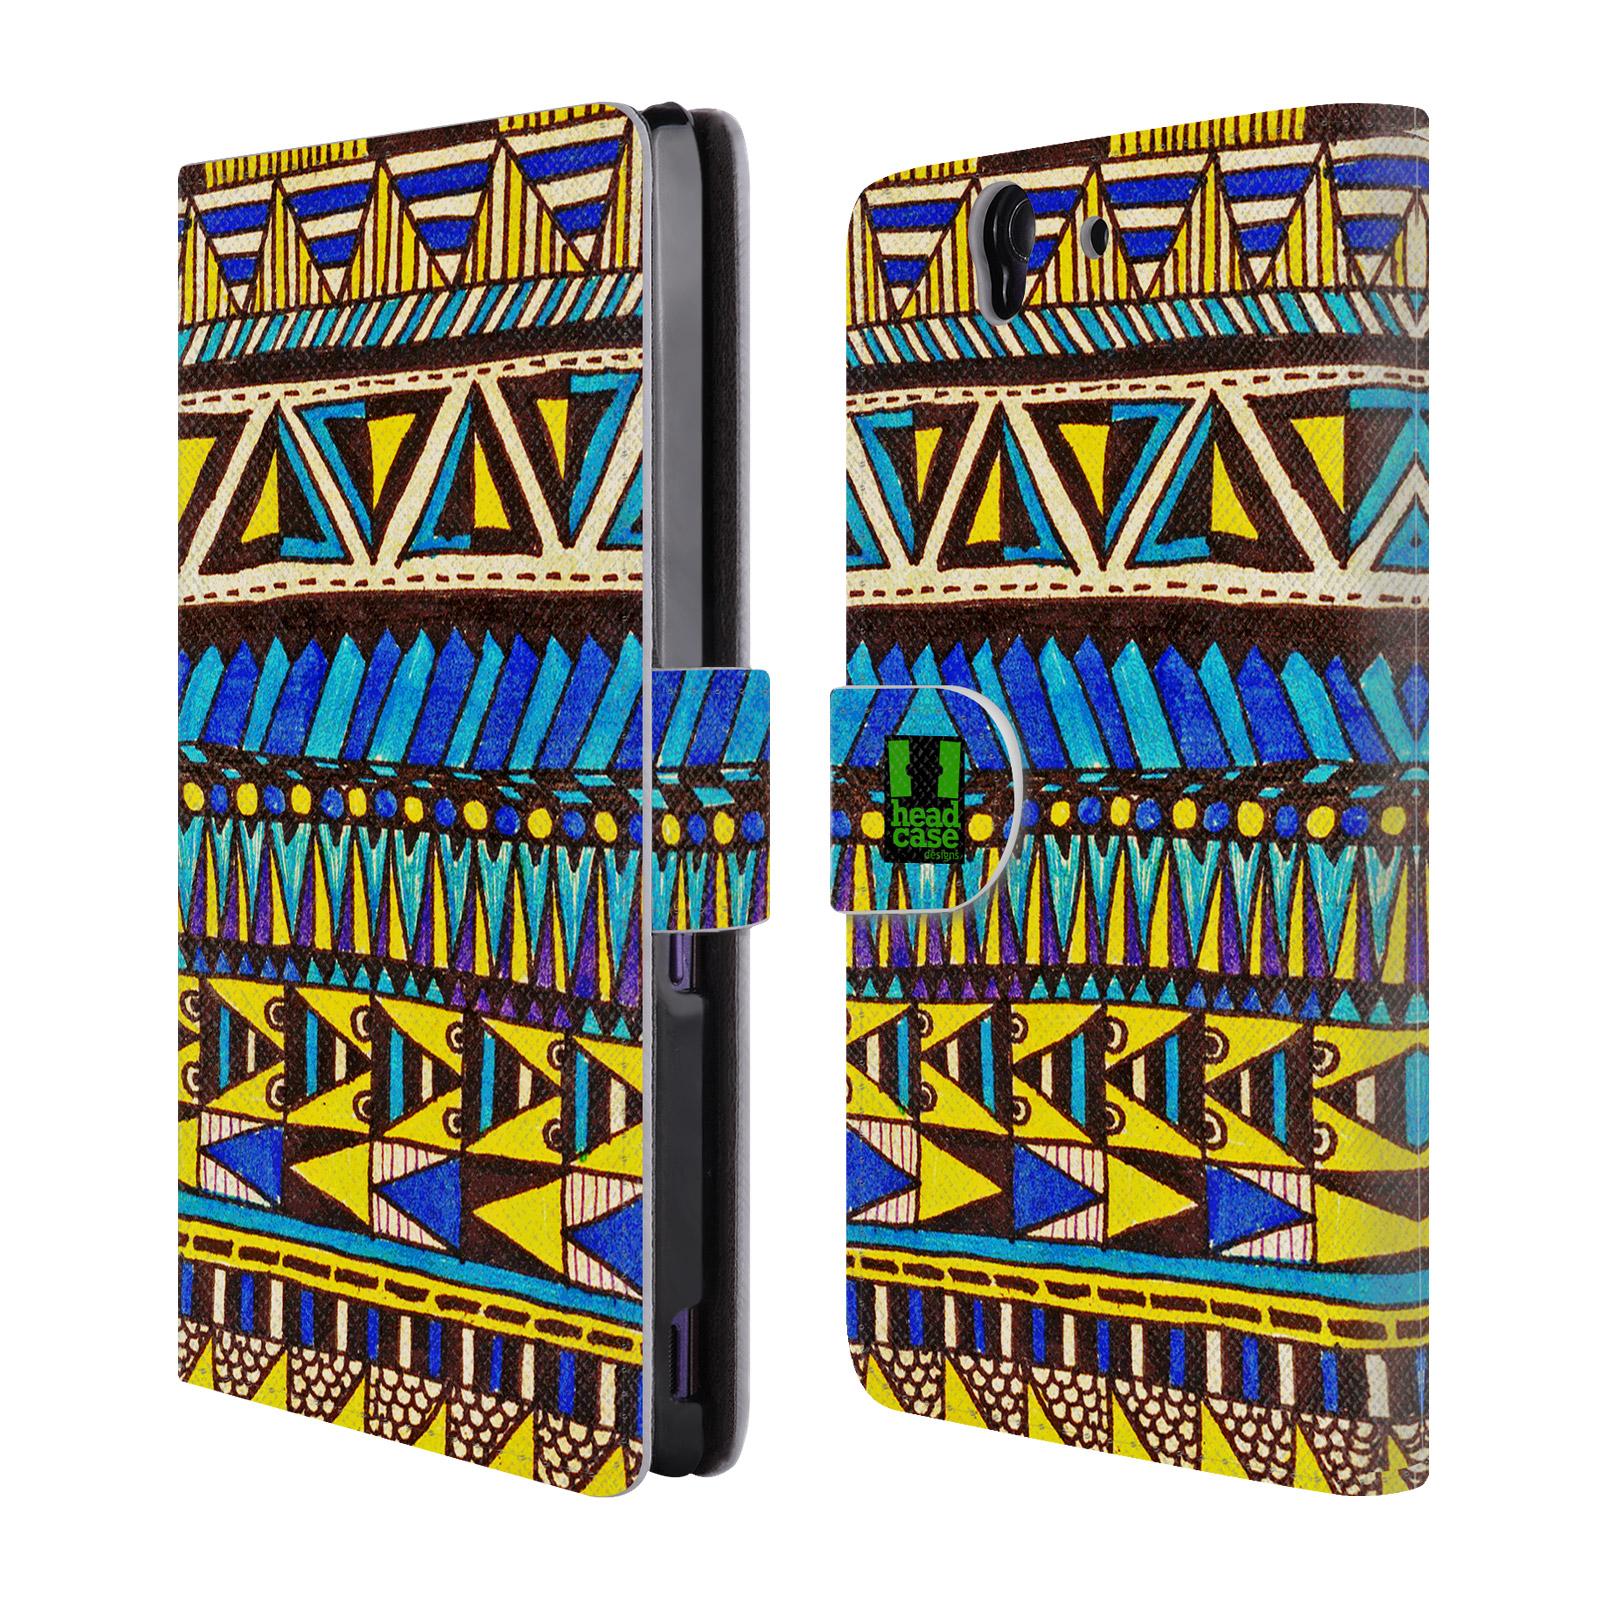 HEAD CASE Flipové pouzdro pro mobil SONY XPERIA Z (C6603) Barevná aztécká čmáranice modrá